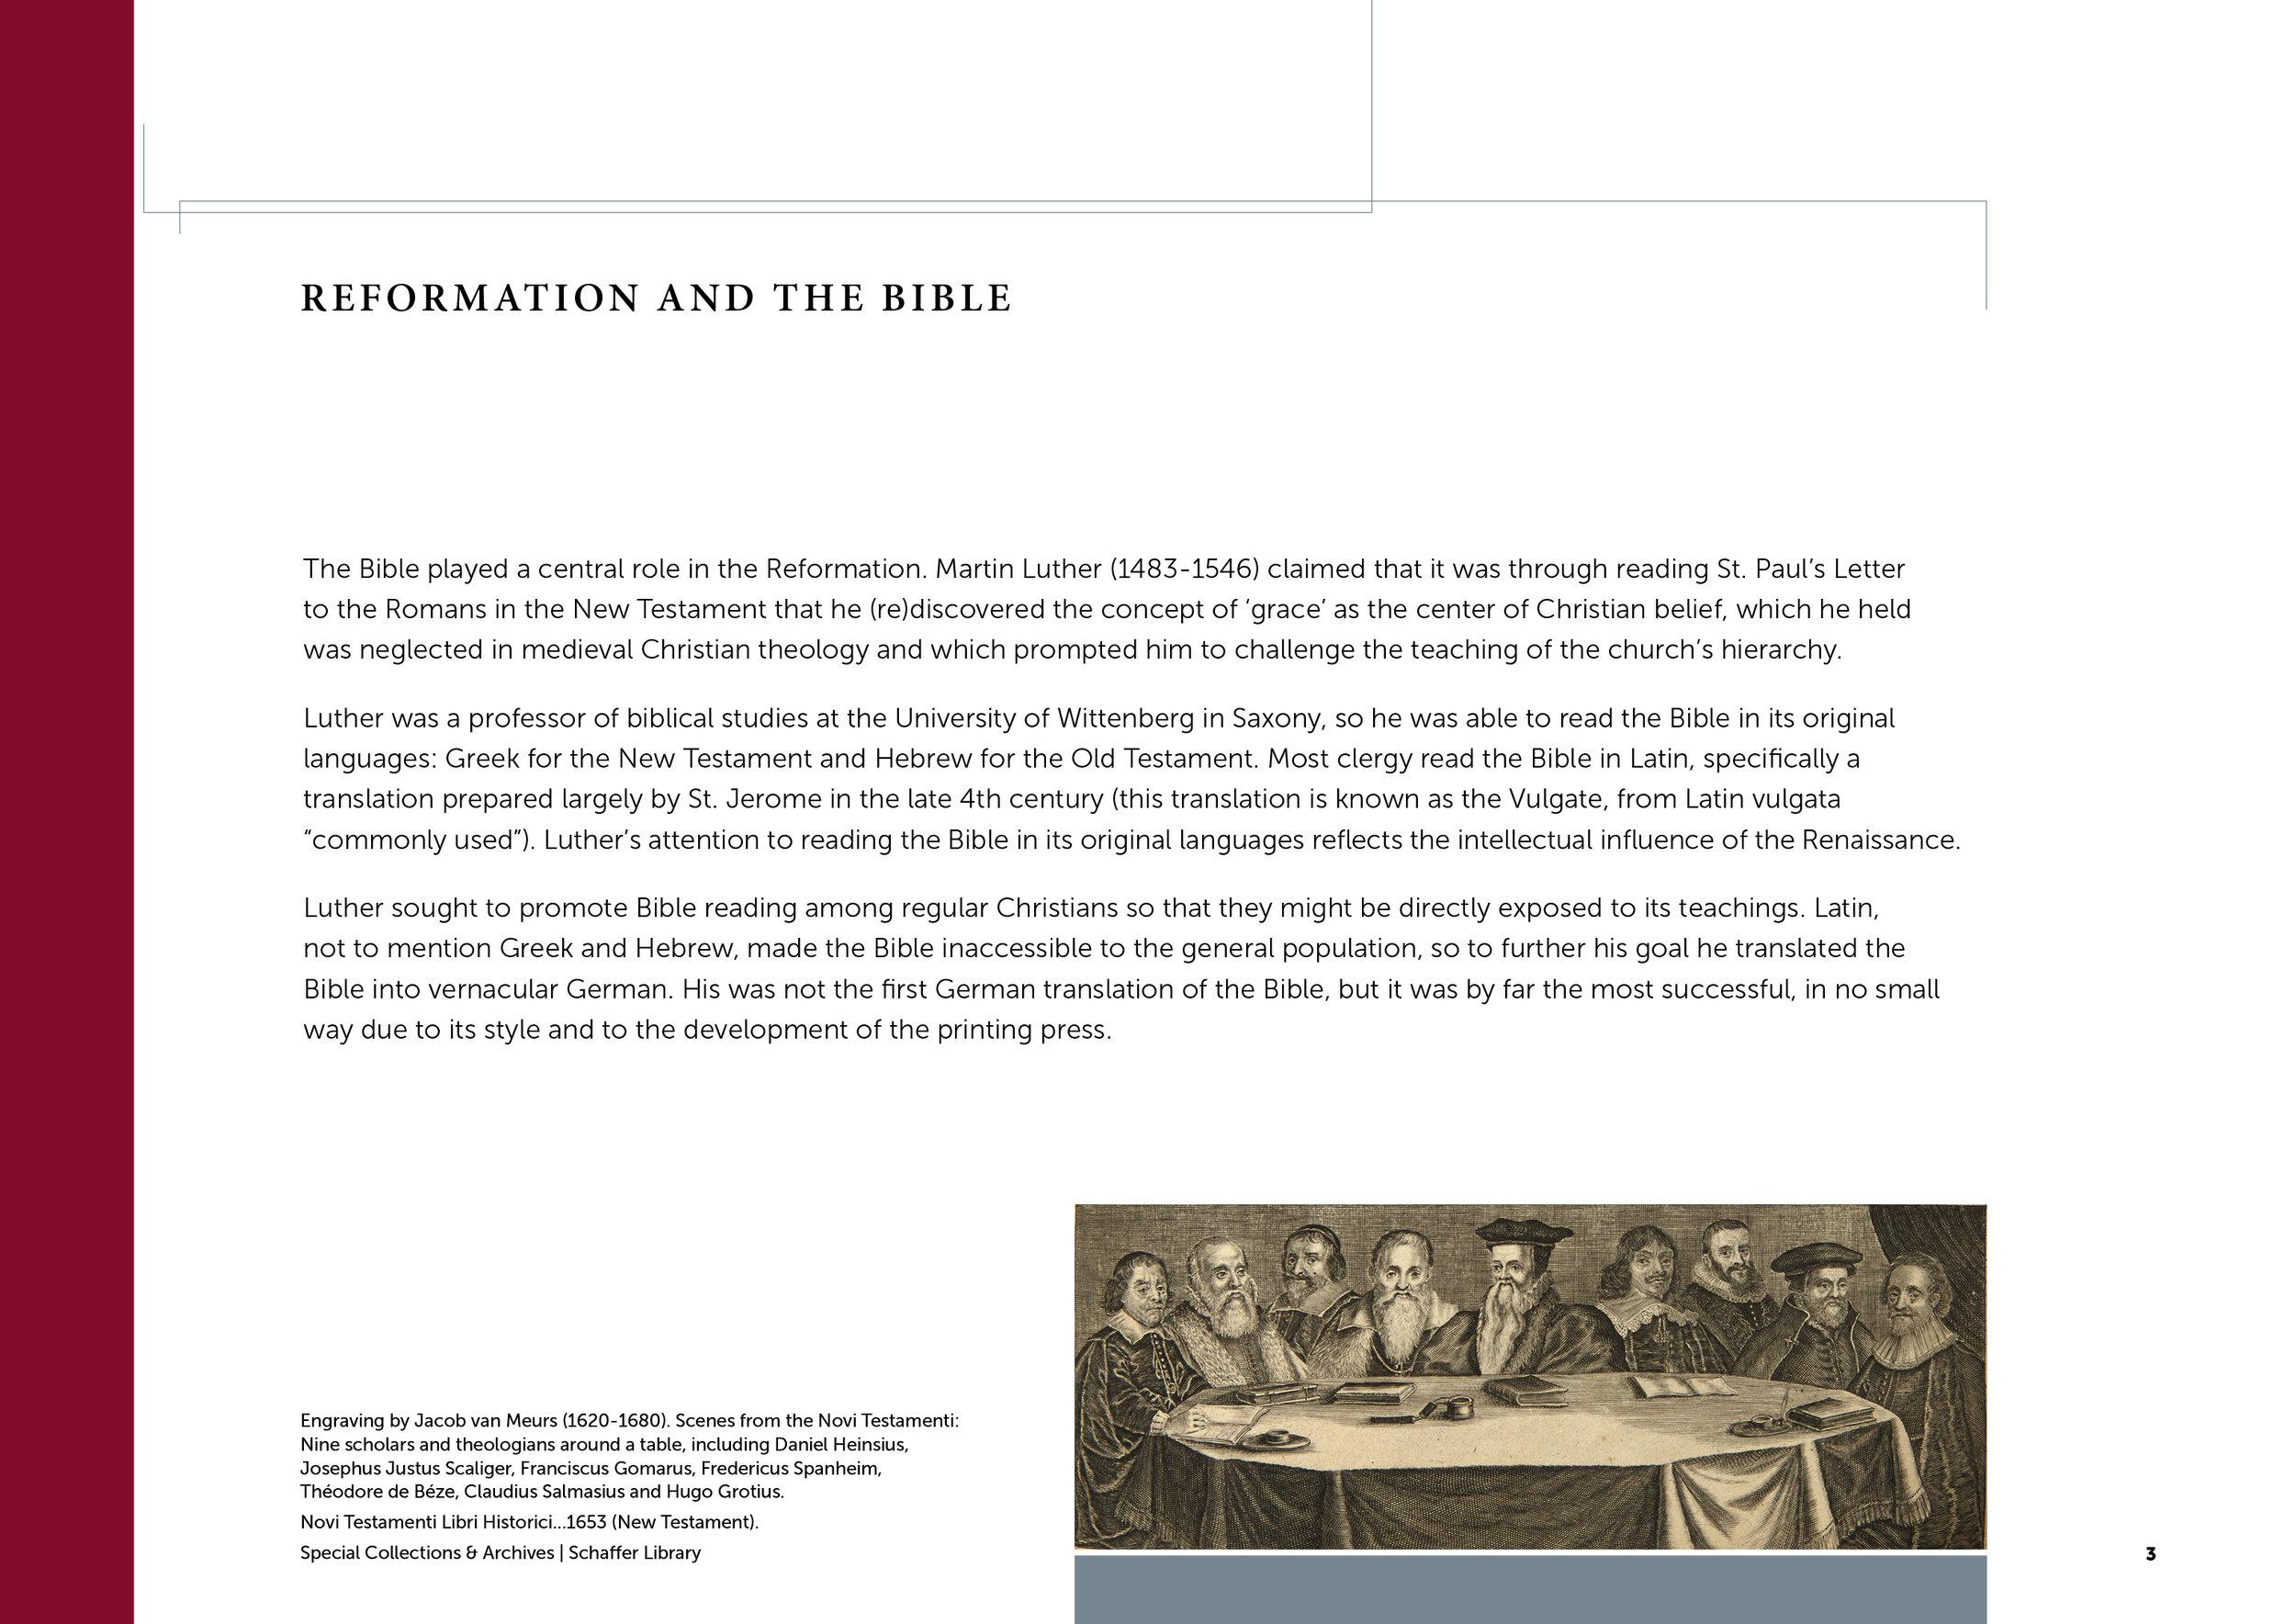 ReformationRestorationandRomeynExhibitBro.1101175.jpg